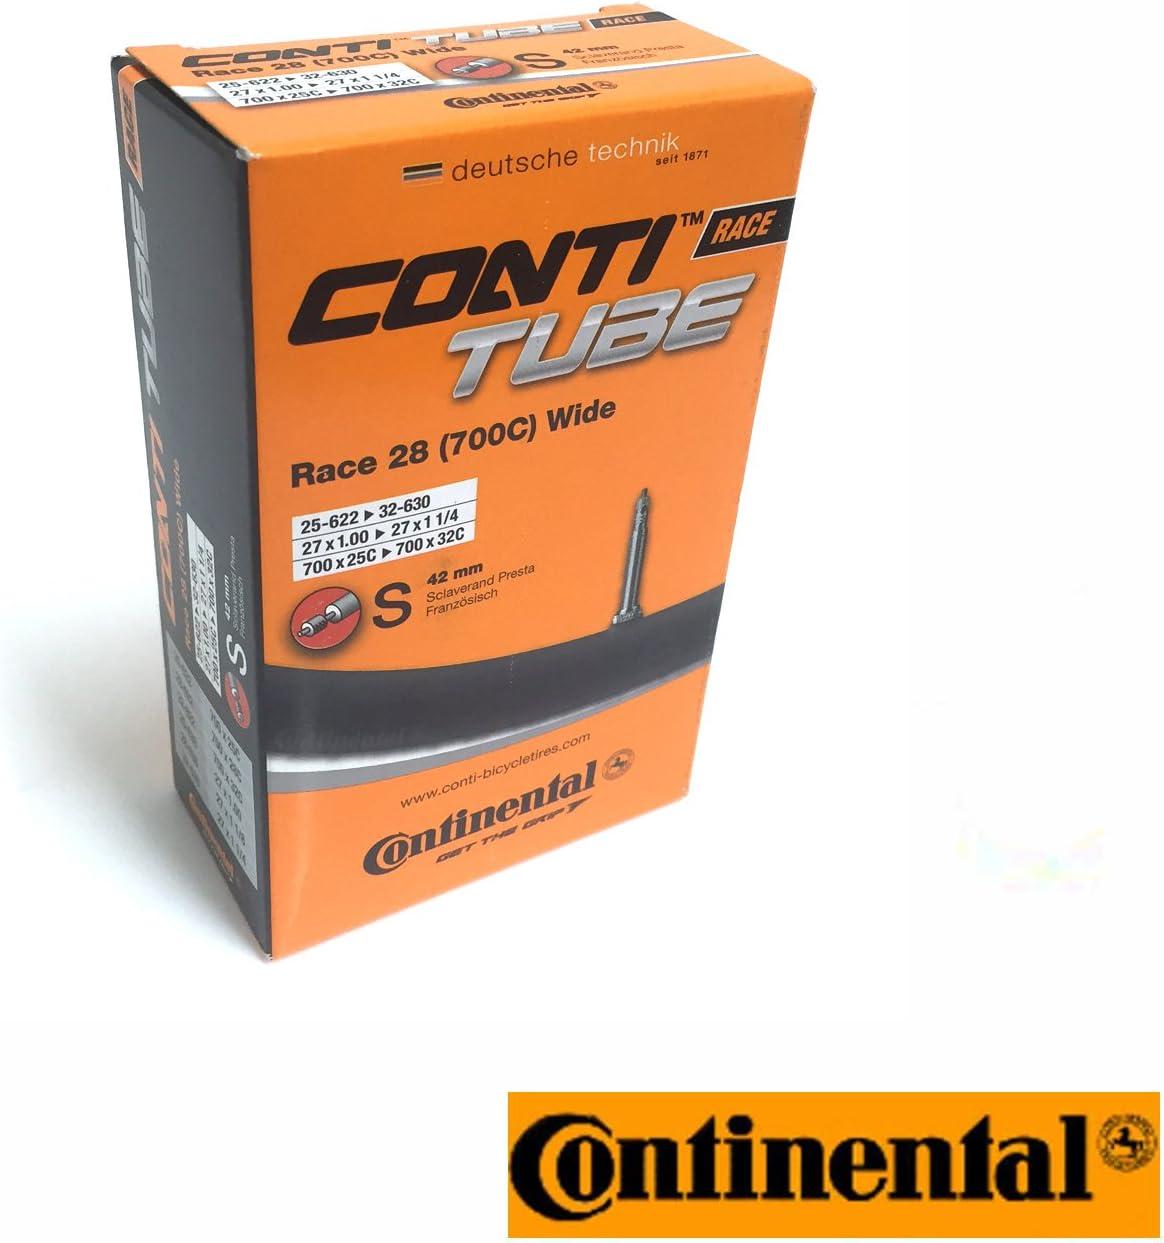 Continental Fahrrad Schlauch Conti TUBE Race 28 Wide, Ausführung ...